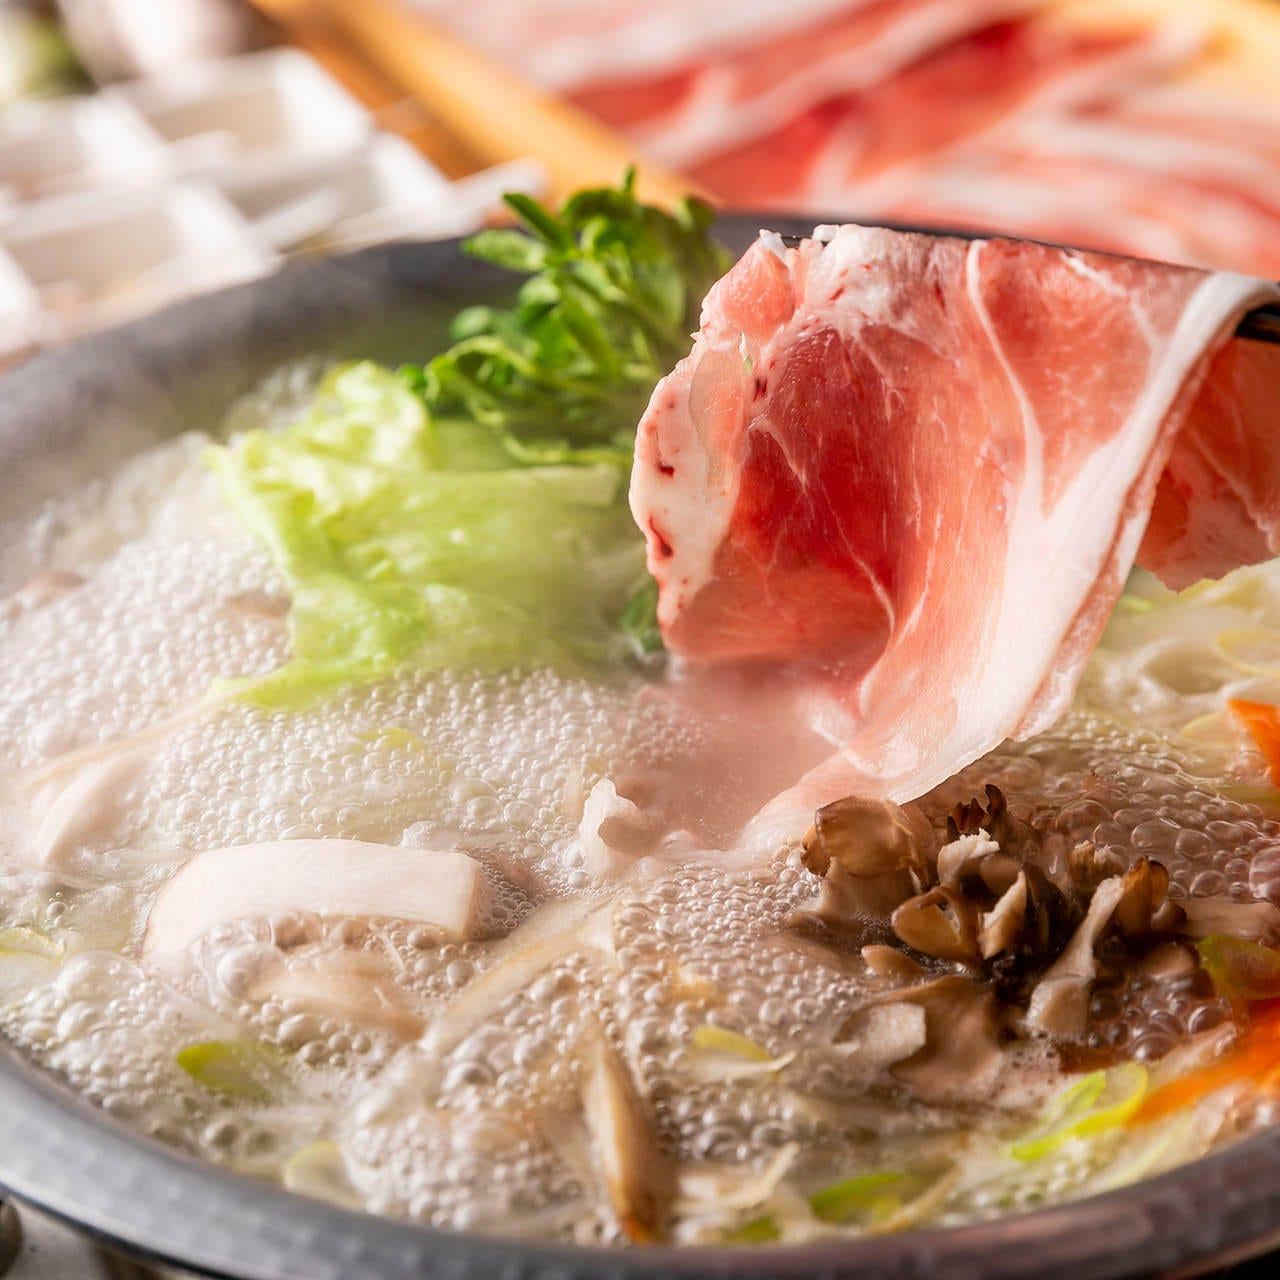 GINZA 春夏秋豚 横浜店のイメージ写真